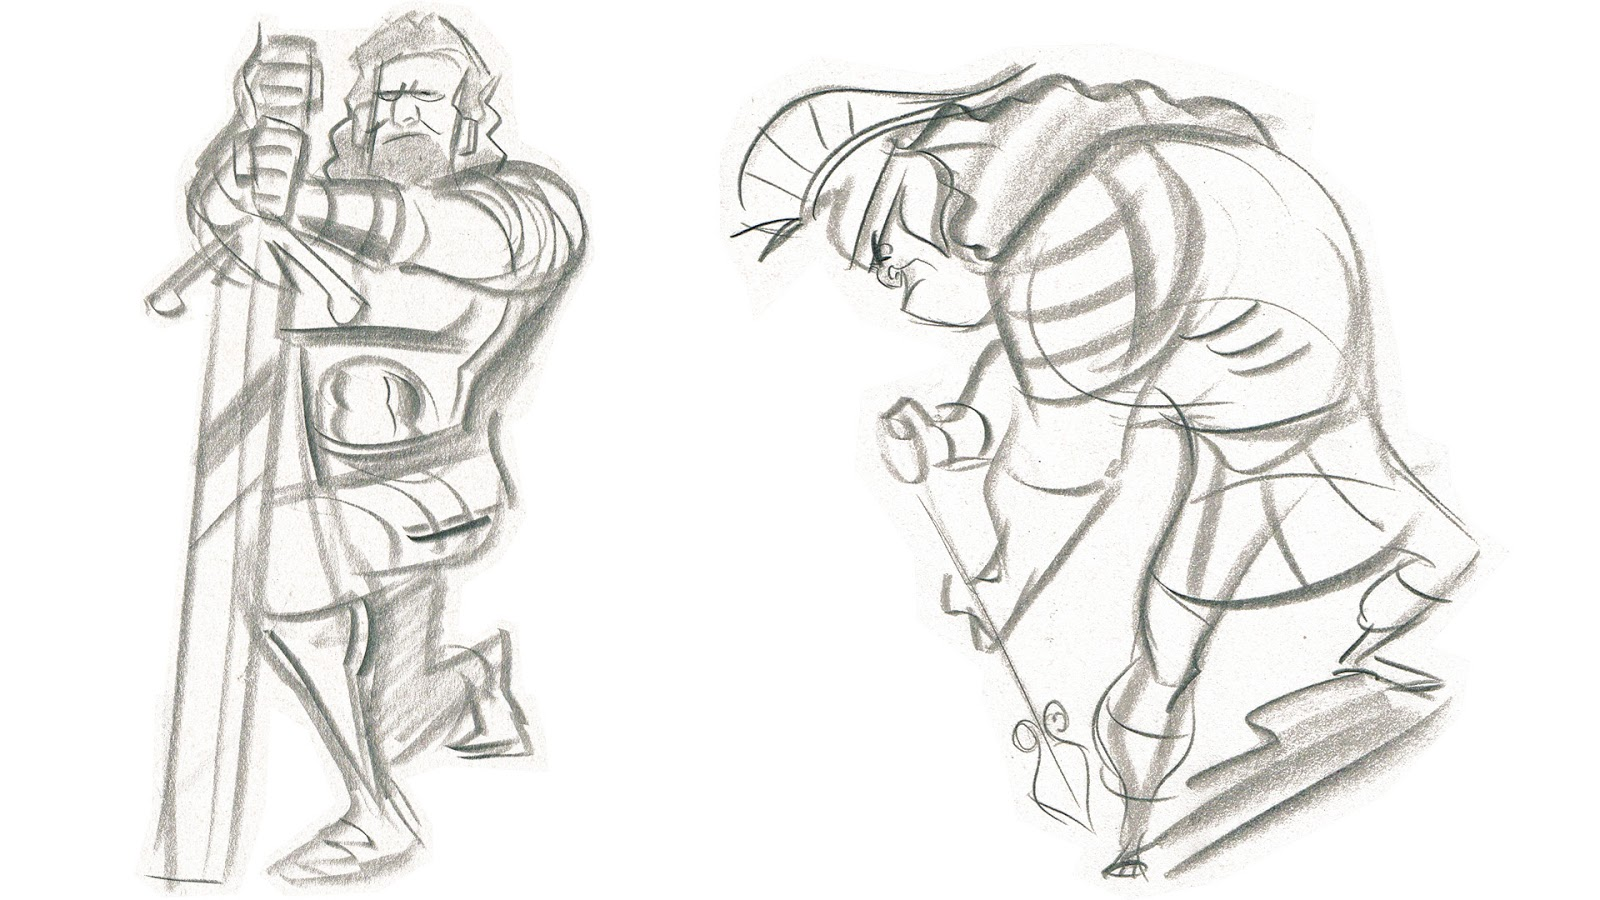 Character Design Life Drawing Pdf : Alan life drawing character design